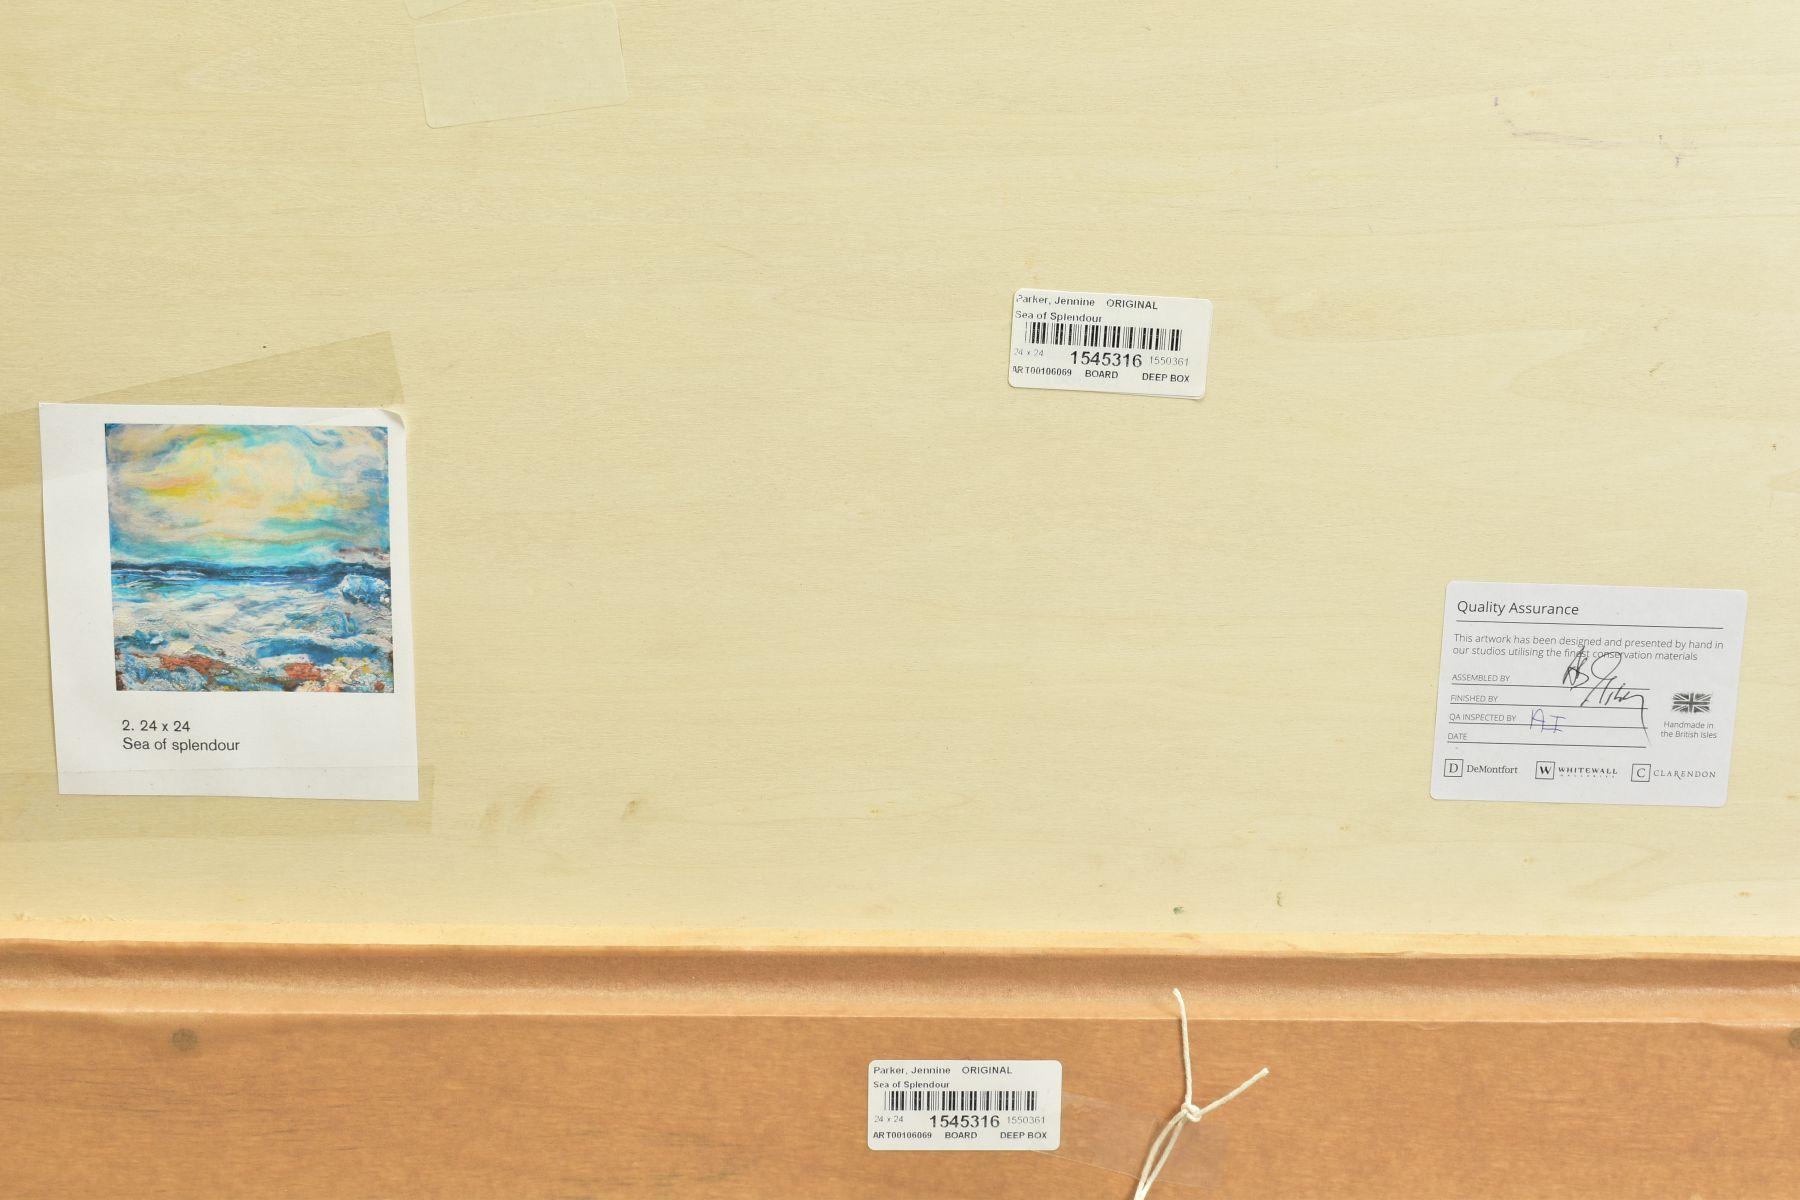 JENNINE PARKER (BRITISH 1971), 'Sea of Splendor', a coastal seascape, initialled bottom right, mixed - Image 7 of 7